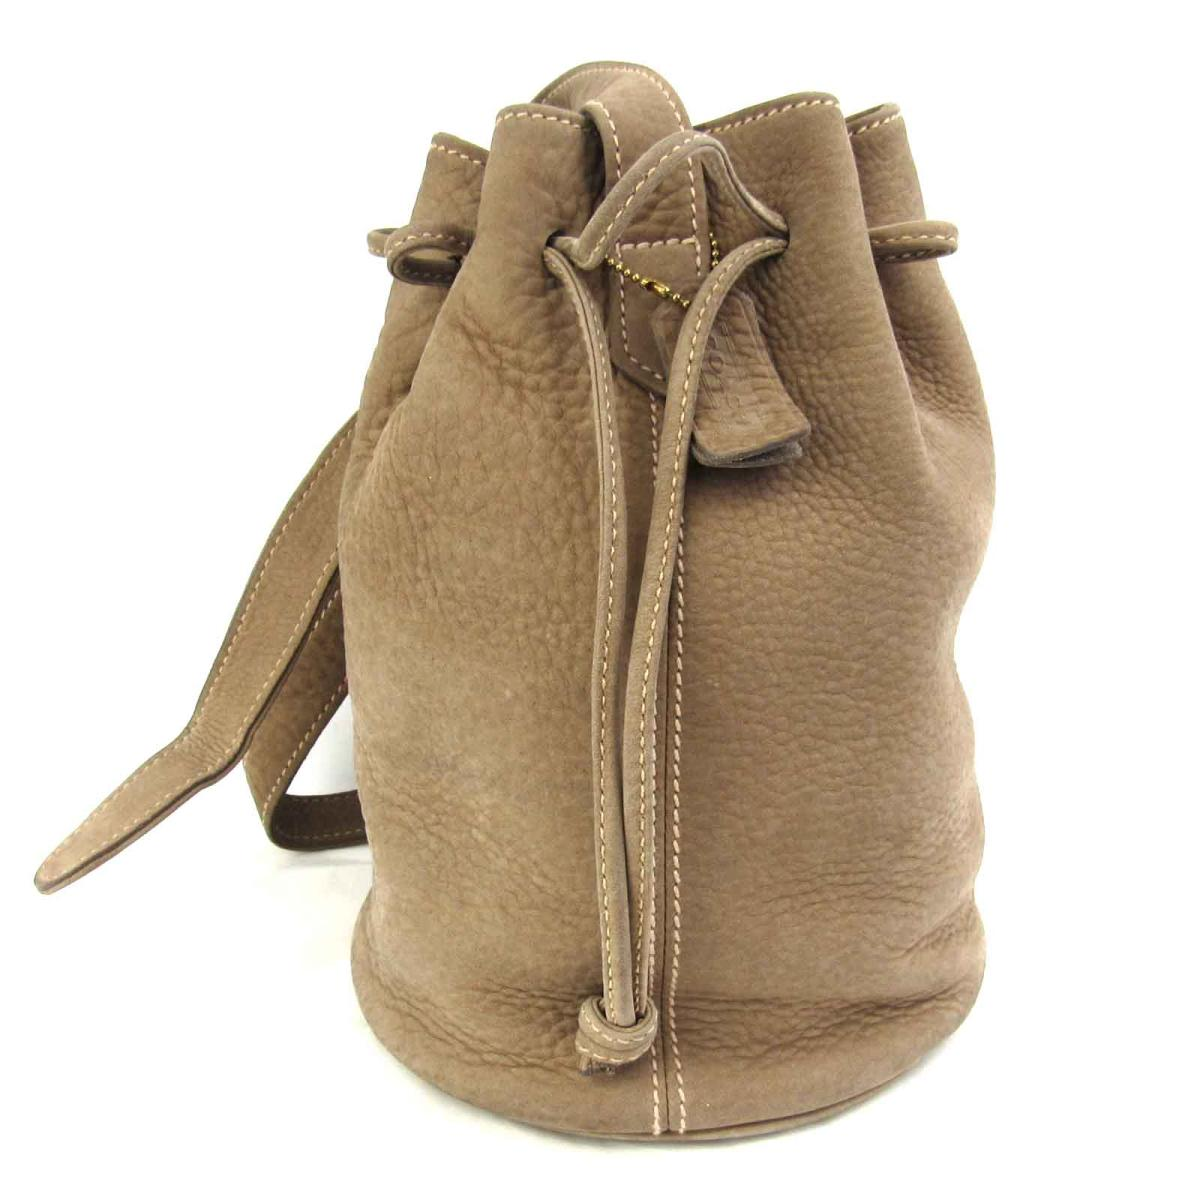 Coach Drawstring Purse Shoulder Bag Lady Leather Suede Beige 4931